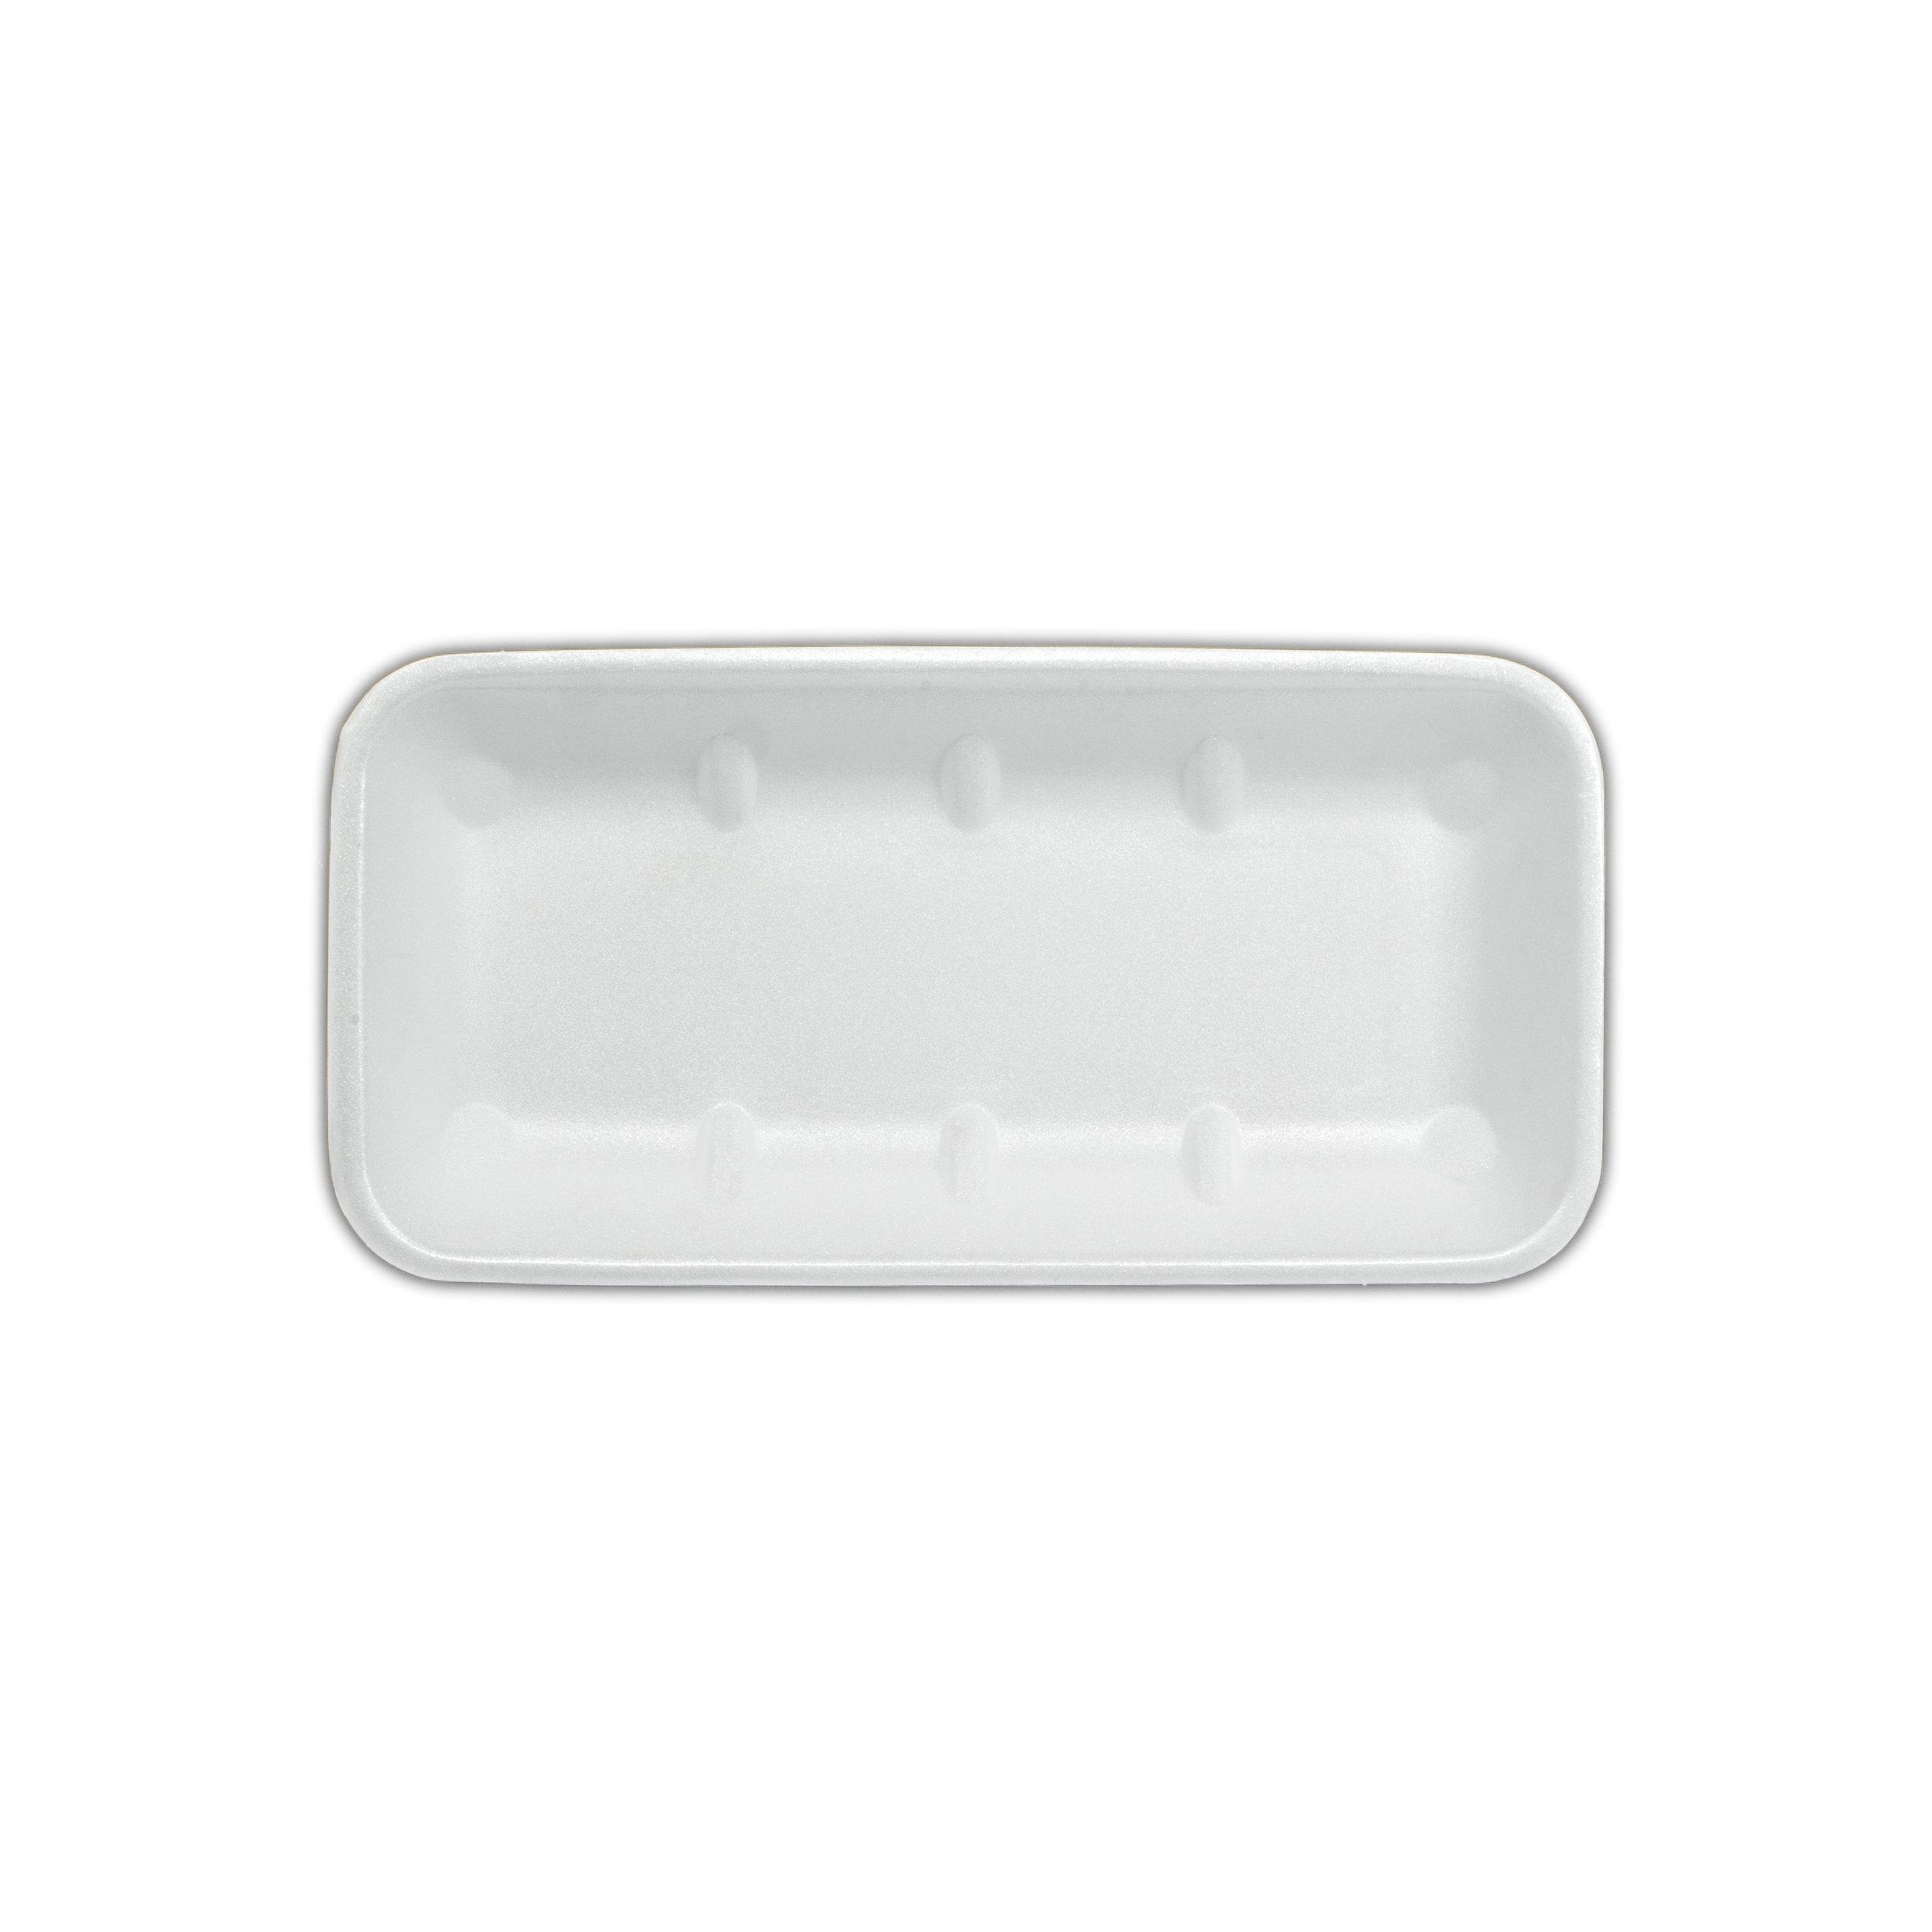 iK0207 CLOSED CELL D  EEP 11x5 WHITE   90 per sleeve 360 per carton